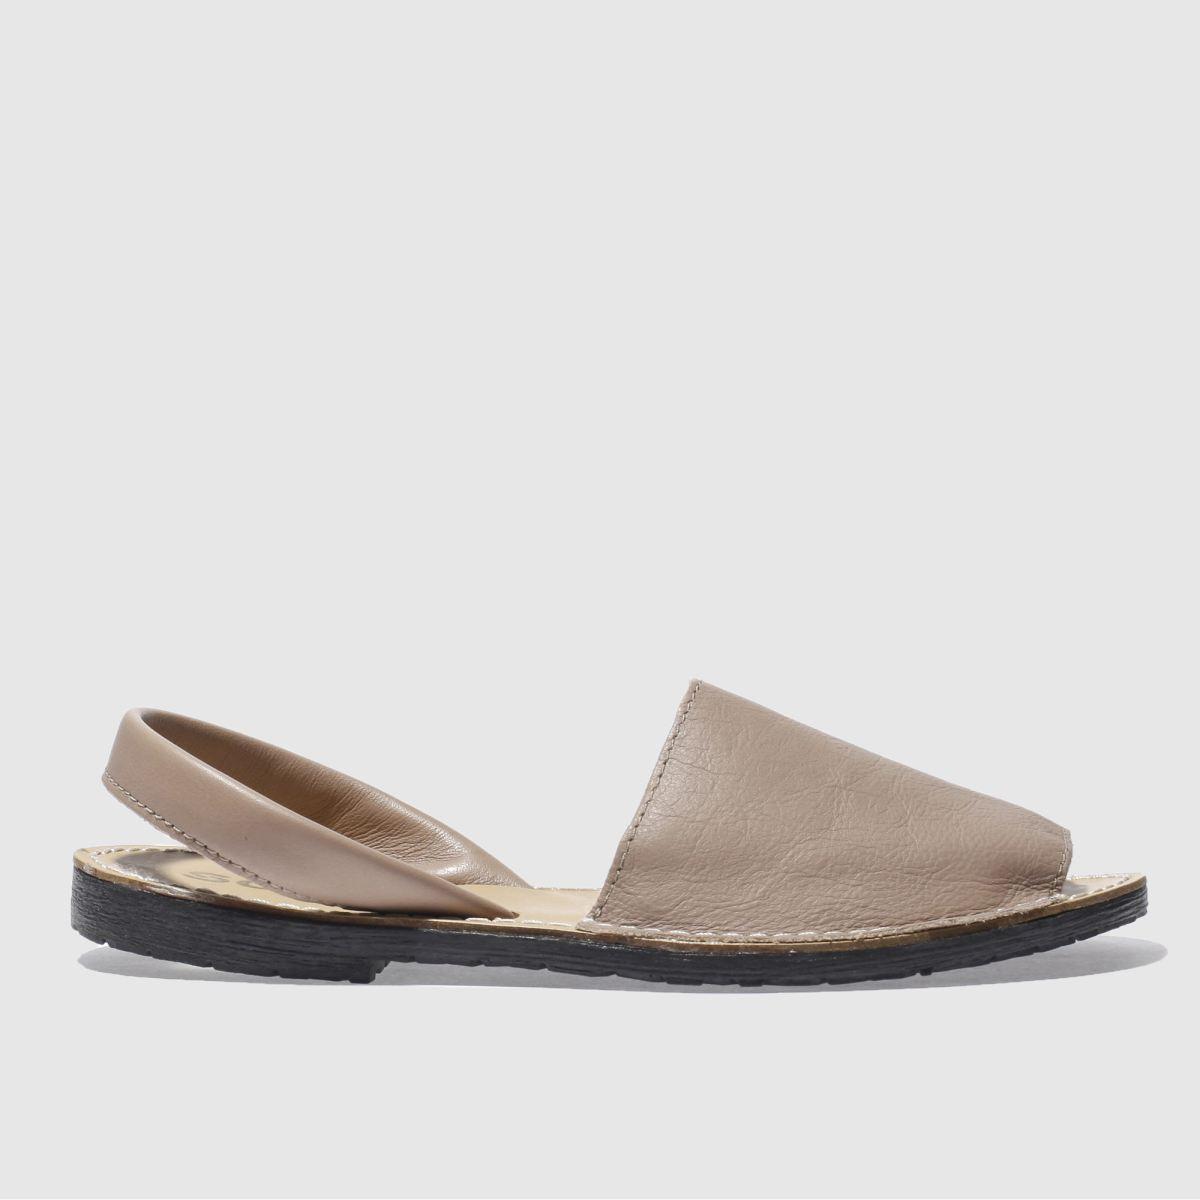 schuh Schuh Natural Barcelona Sandals